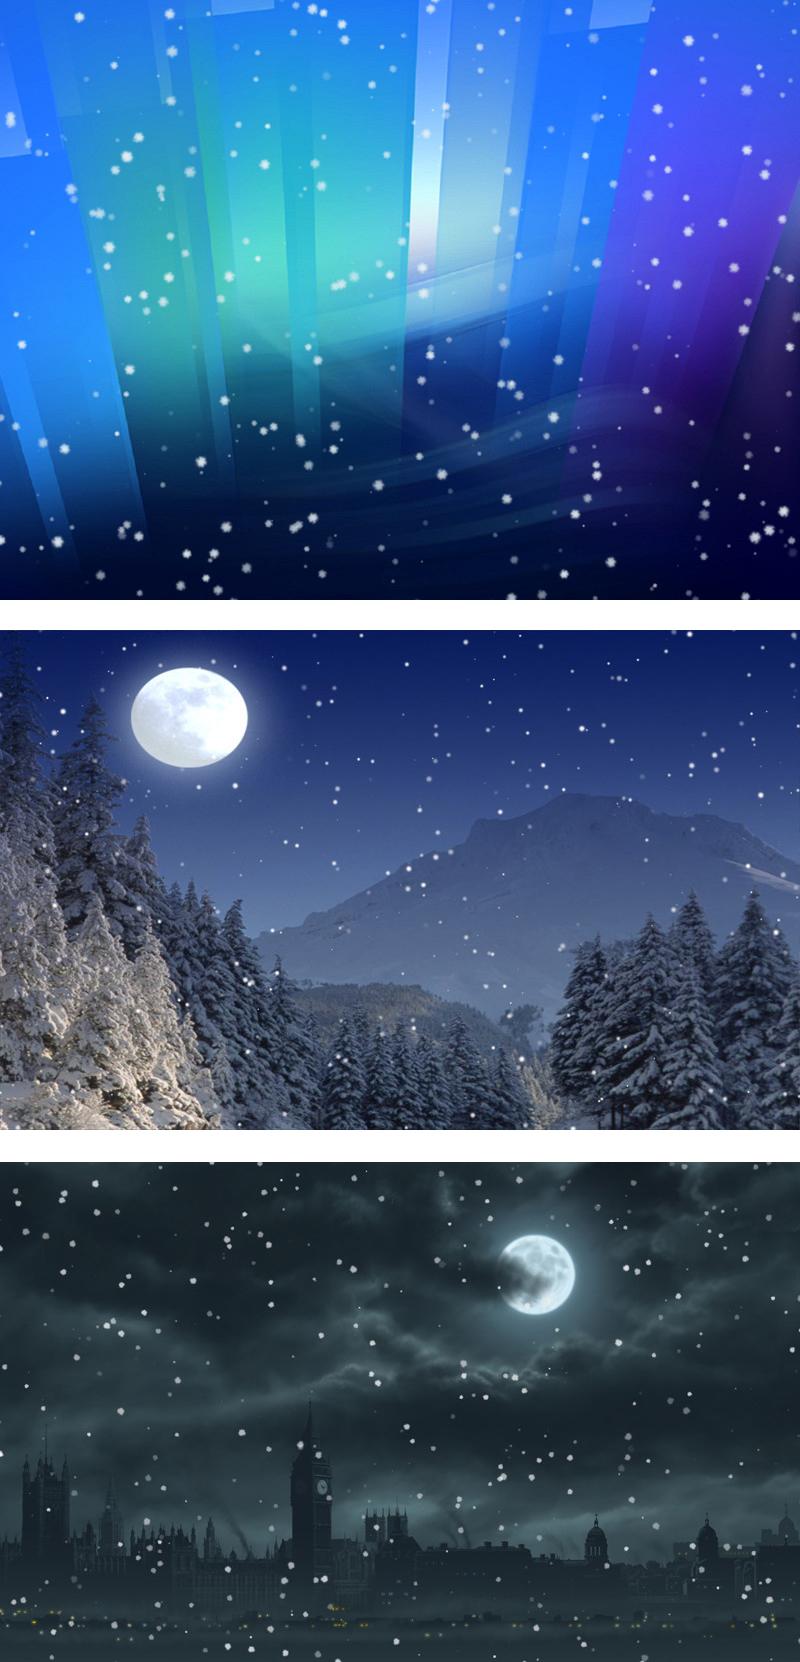 Free Desktop Wallpaper Falling Snow Snow Over Desktop Screensaver Screensaver Software For Pc